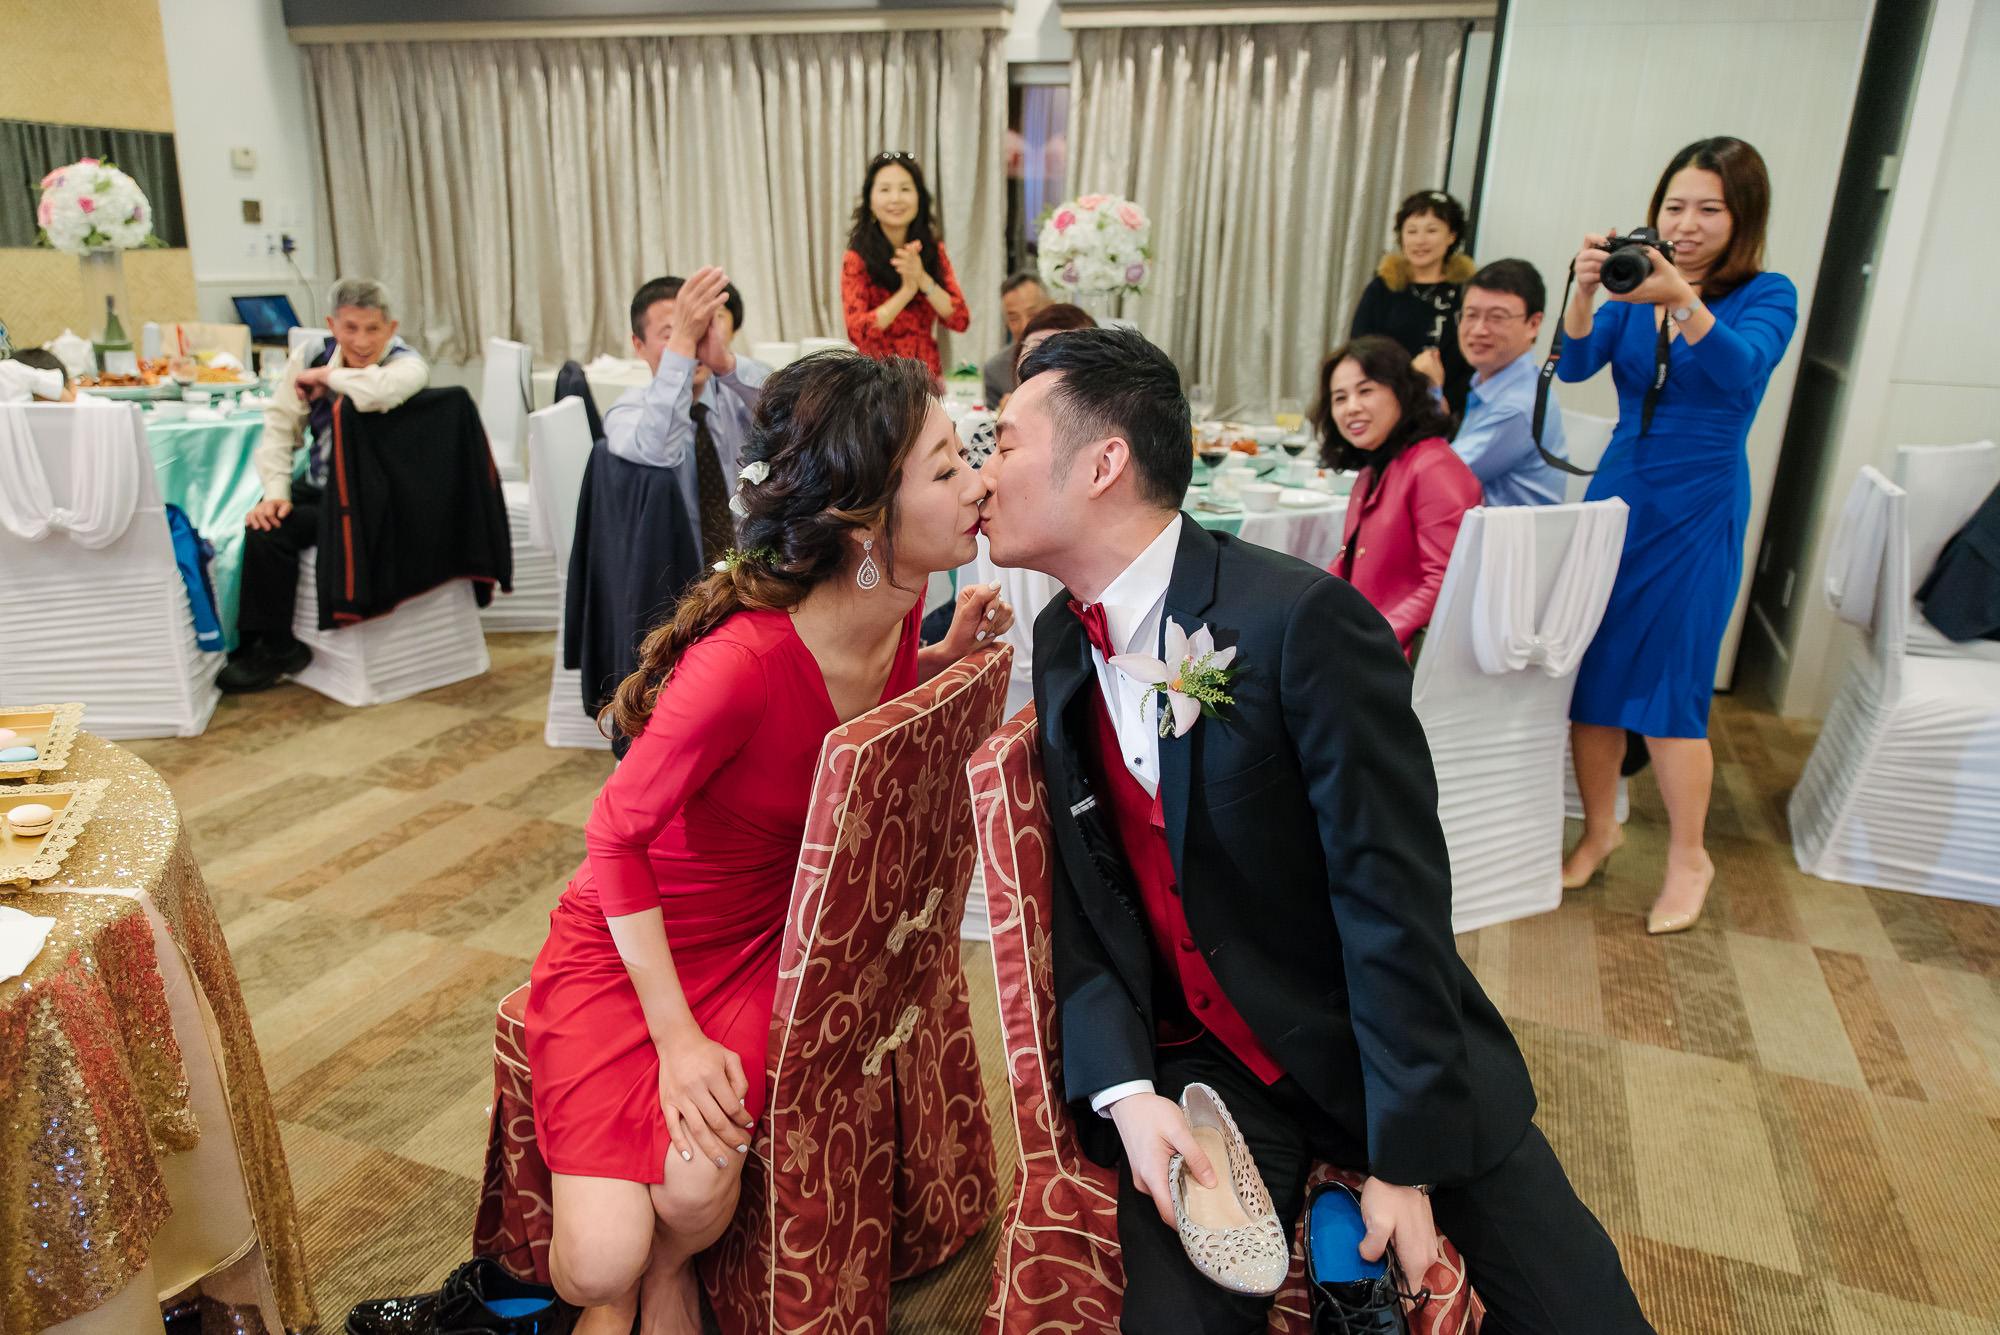 richmond_wedding_reception 21040810.jpg